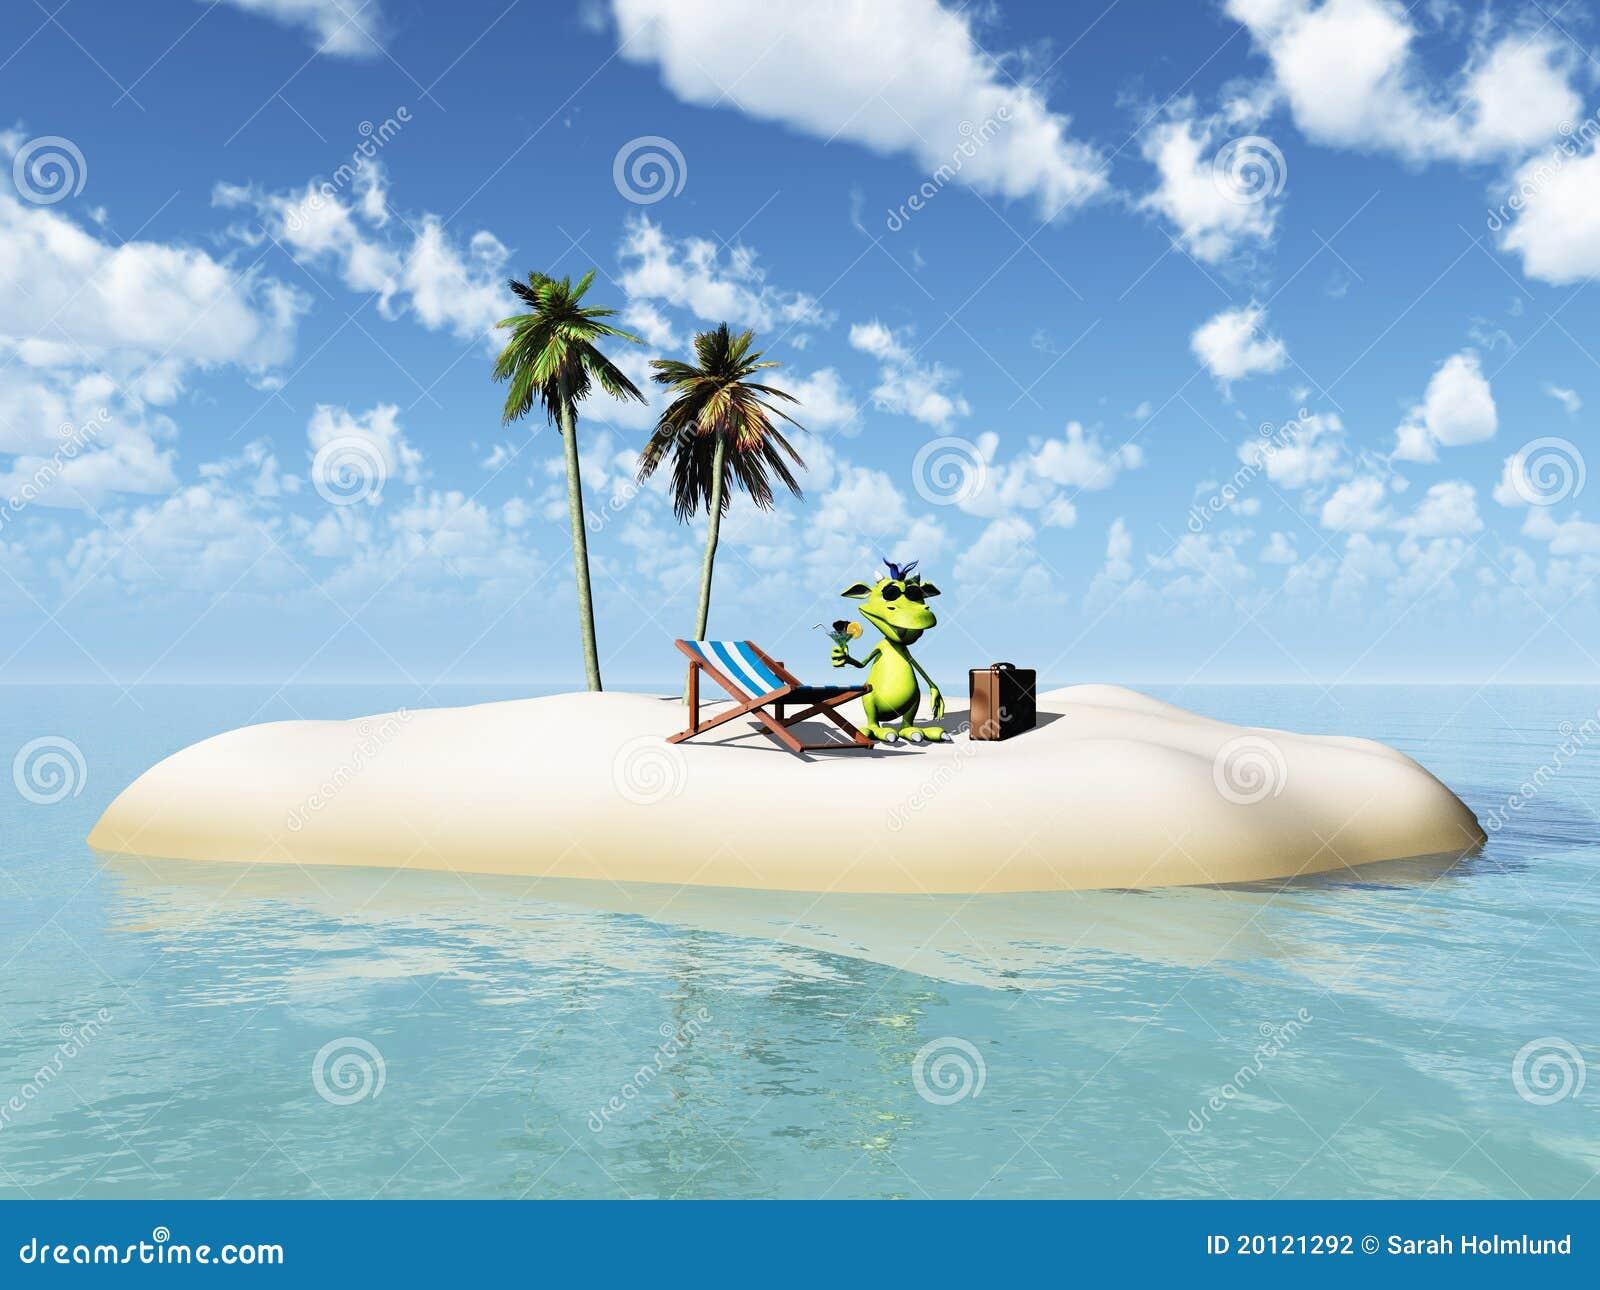 Turquoise Bathroom Cute Cartoon Monster Taking Vacation On Island Stock